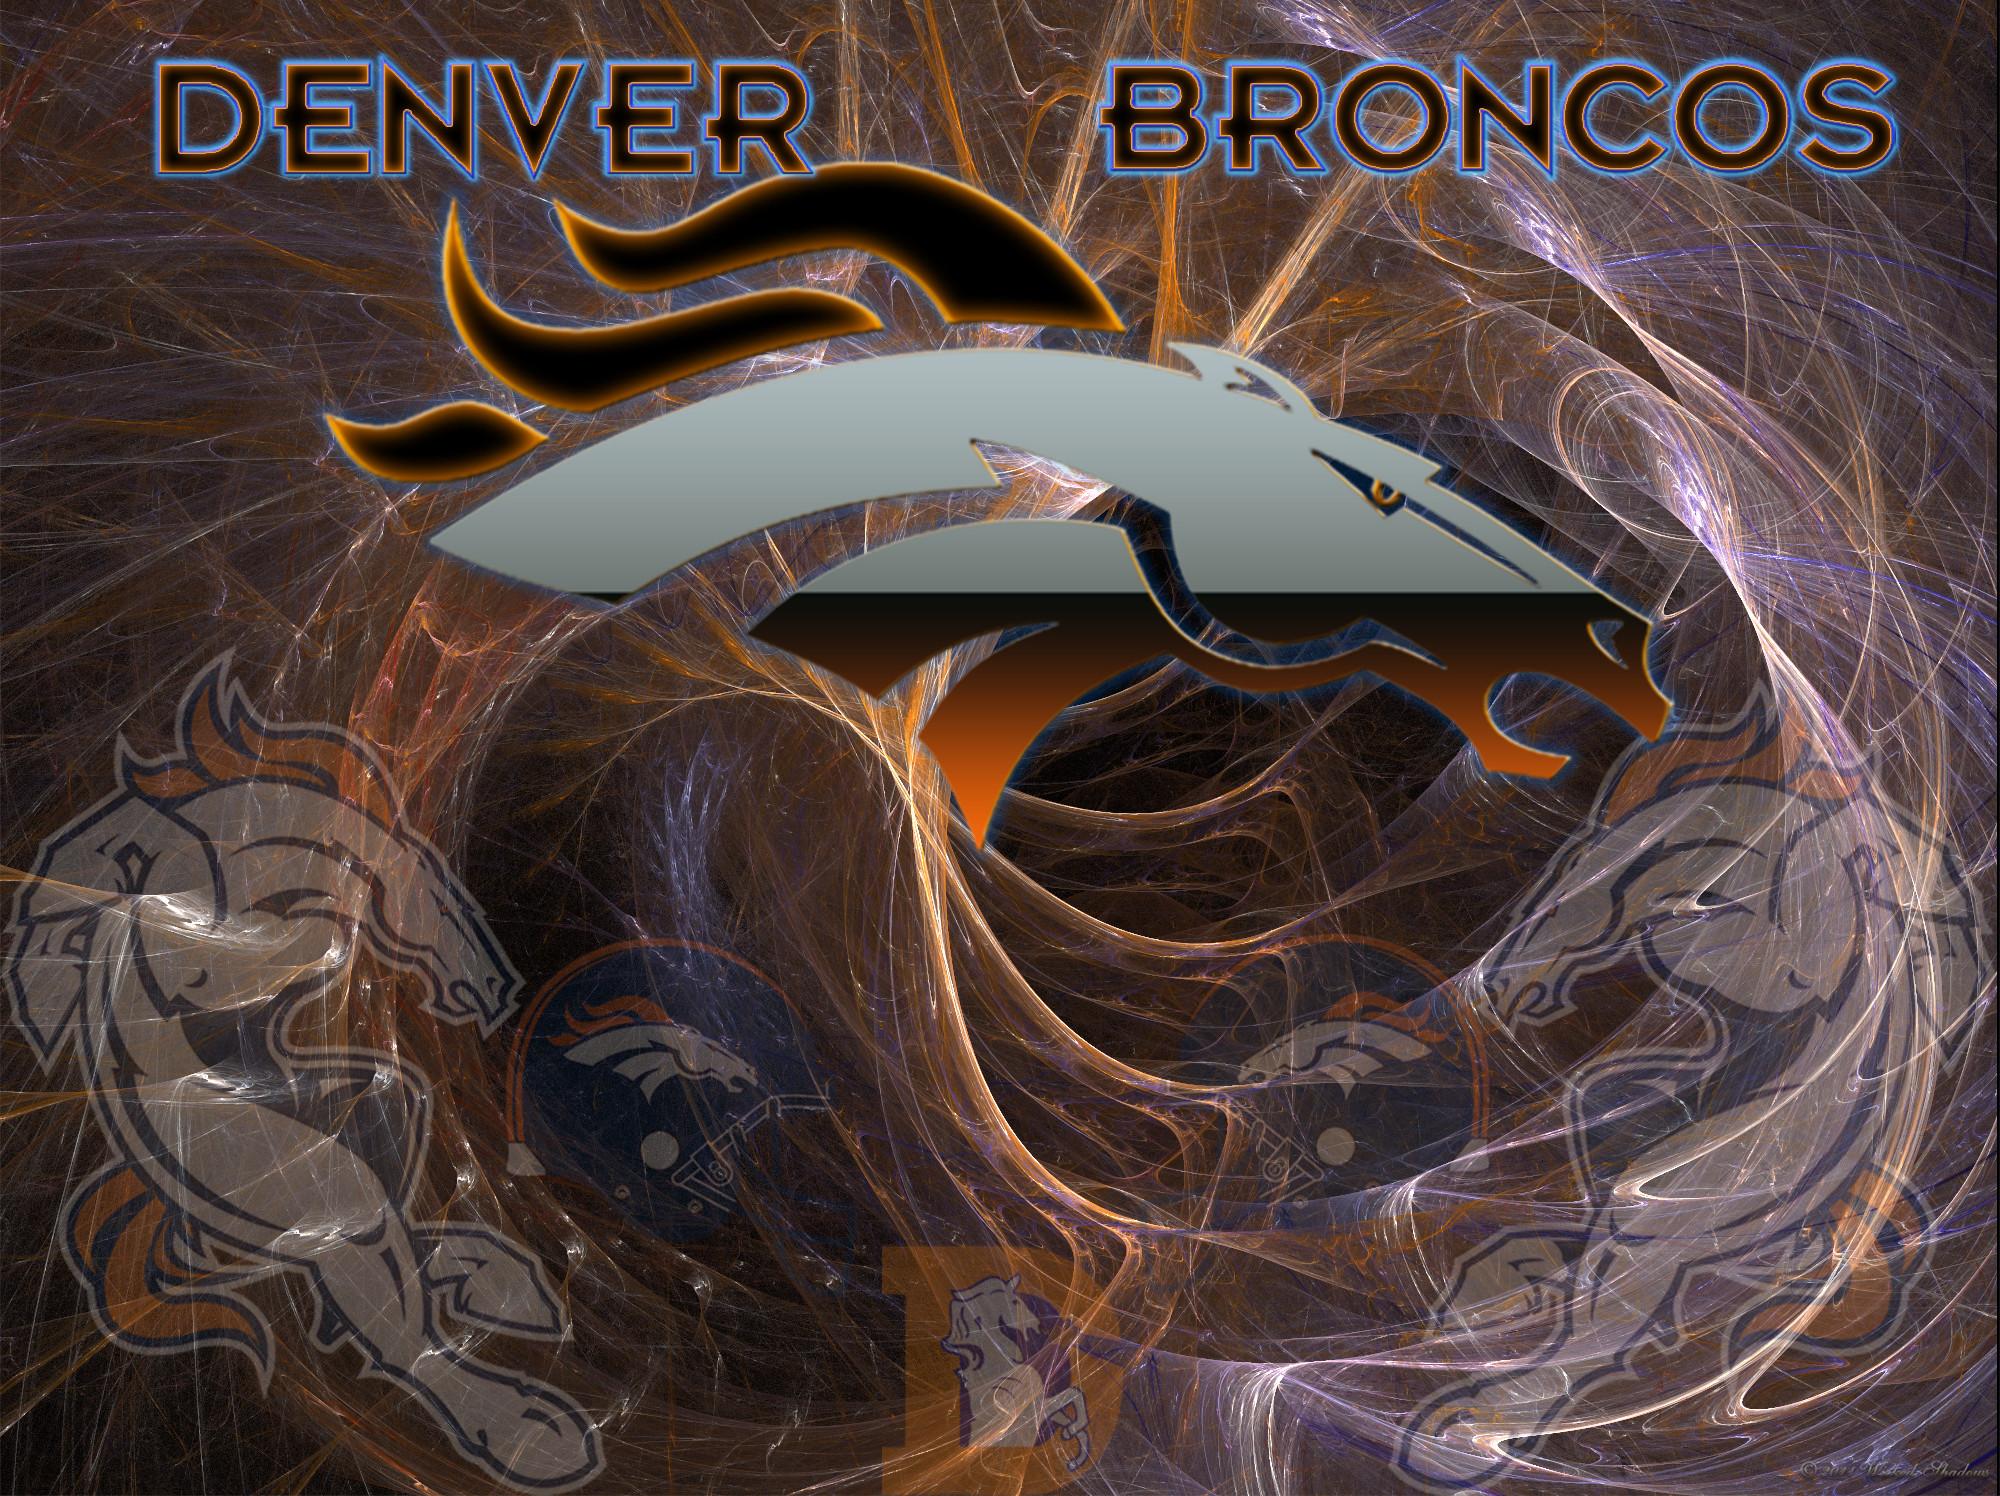 Denver Broncos Wild Wallpaper